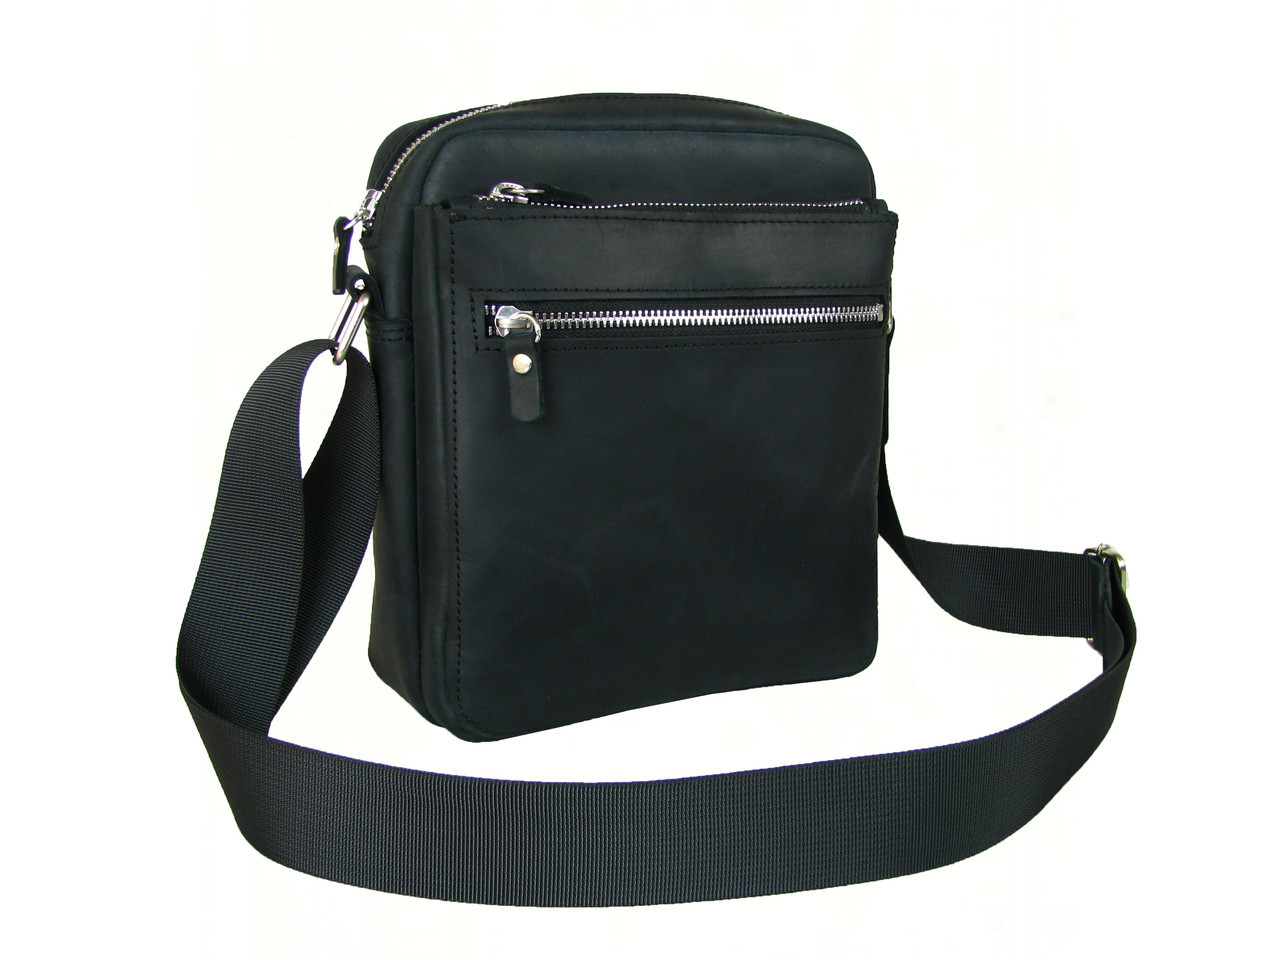 Кожаная сумка мужская GS черная